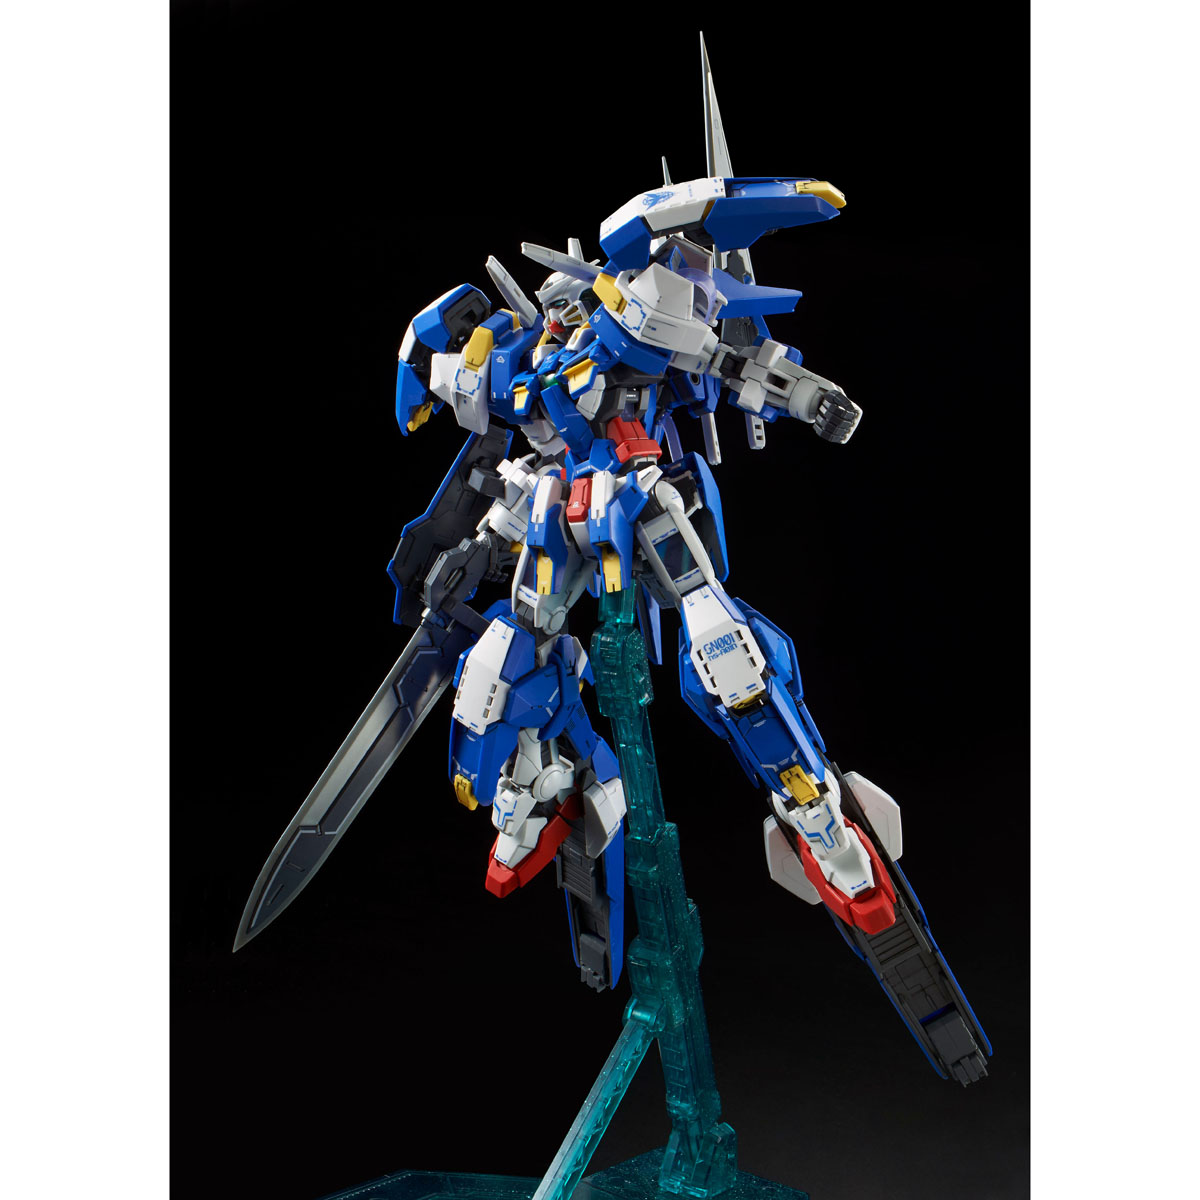 gundam exia model kit - HD1151×1600